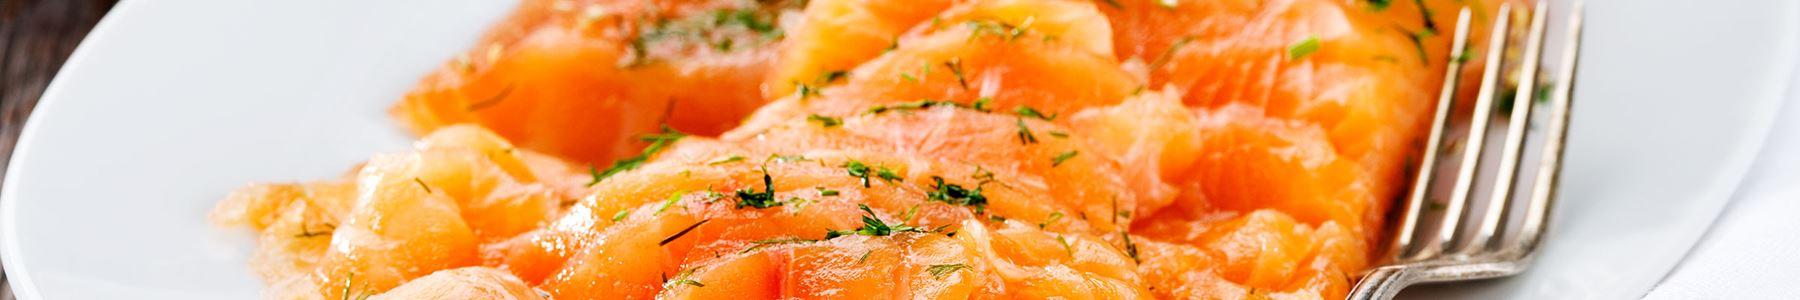 Fisk + Midsommar + Lunch